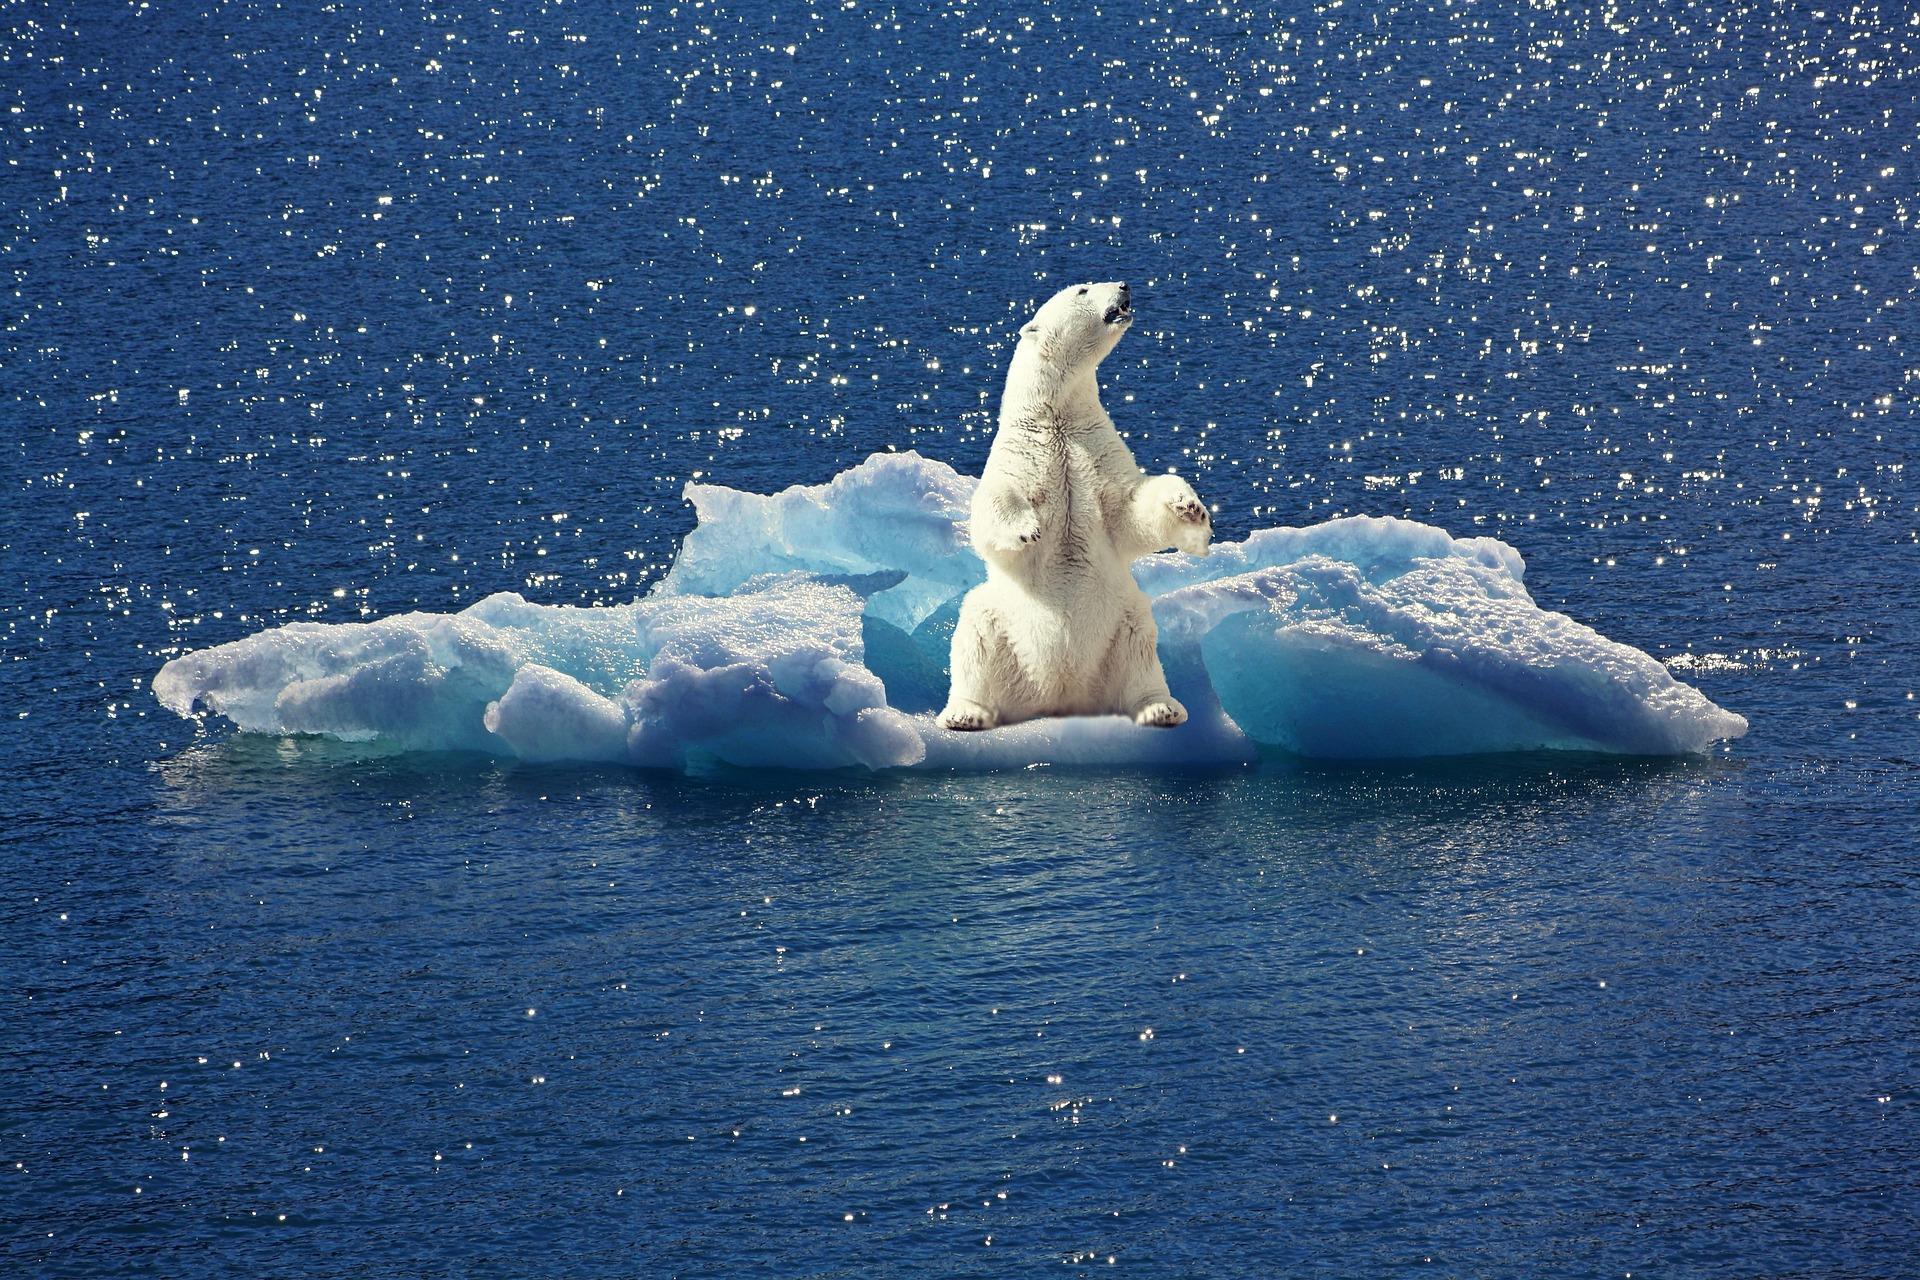 Photo of a Polar bear sitting on a tiny platform of melting ice